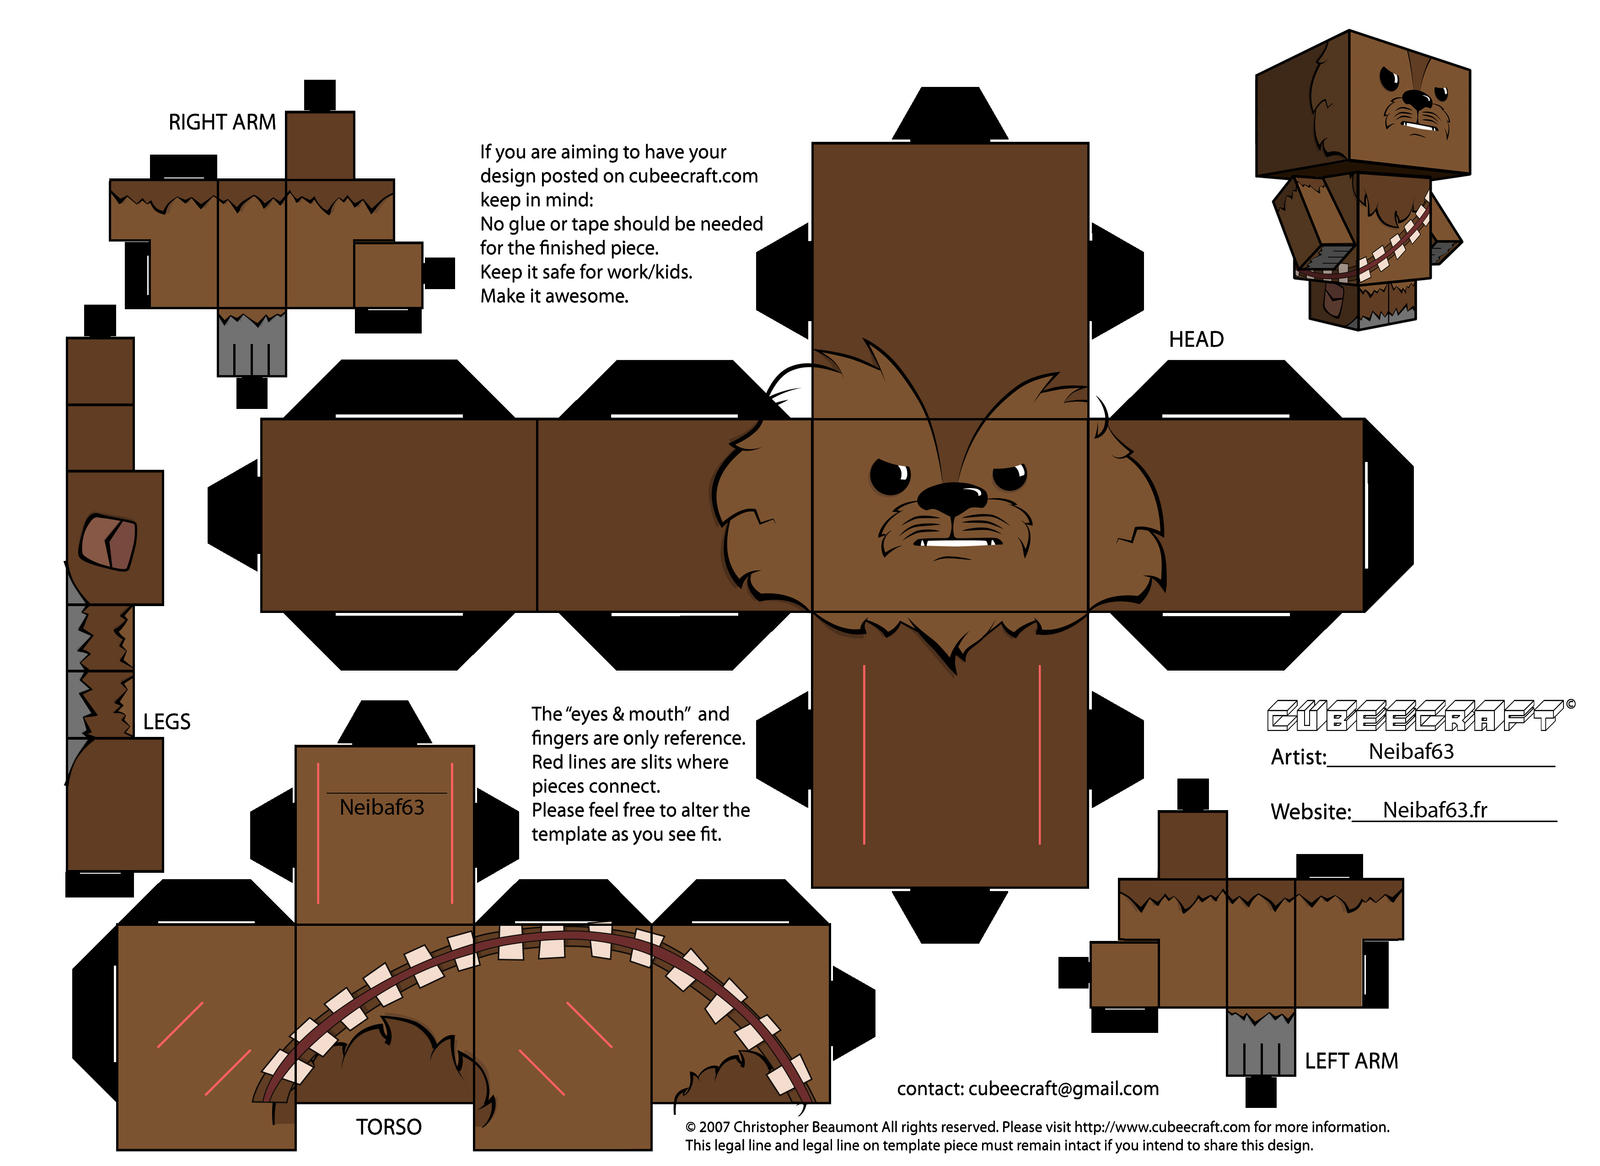 chewbacca template cubeecraft by neibaf63 on deviantart. Black Bedroom Furniture Sets. Home Design Ideas